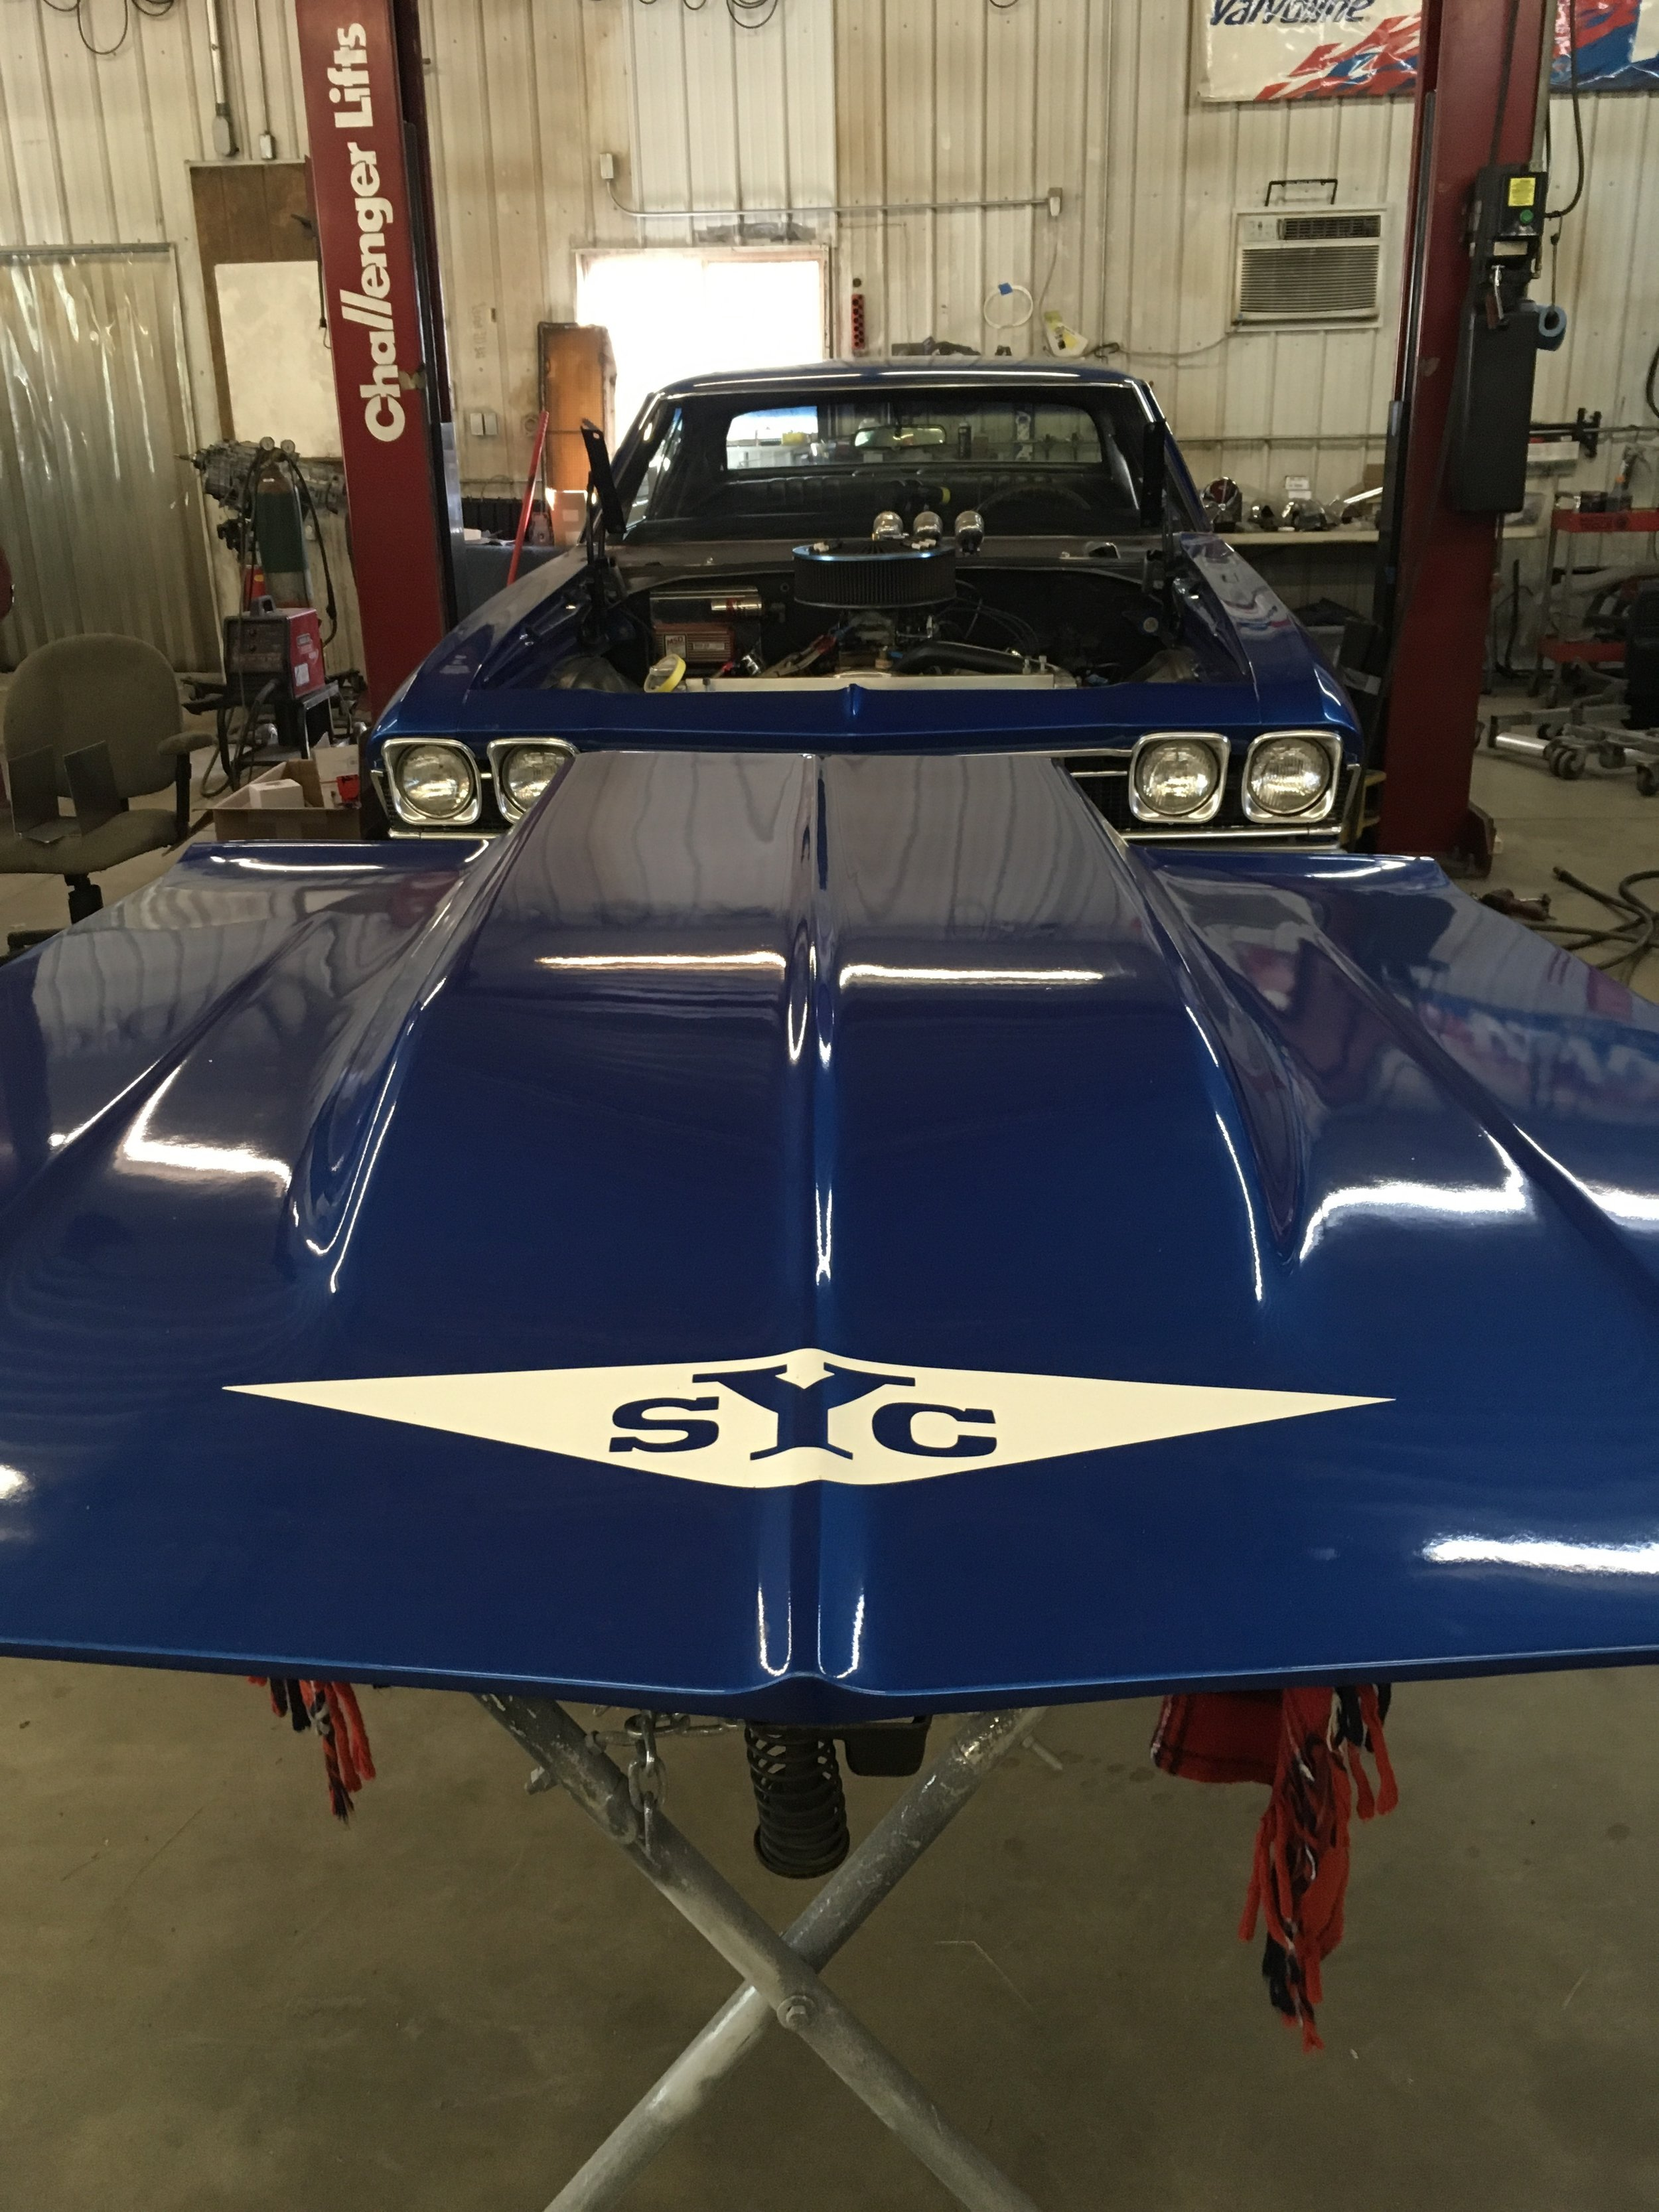 1968-chevelle-yenko-minneapolis-hot-rod-factory-car-restoration-body-work.jpg